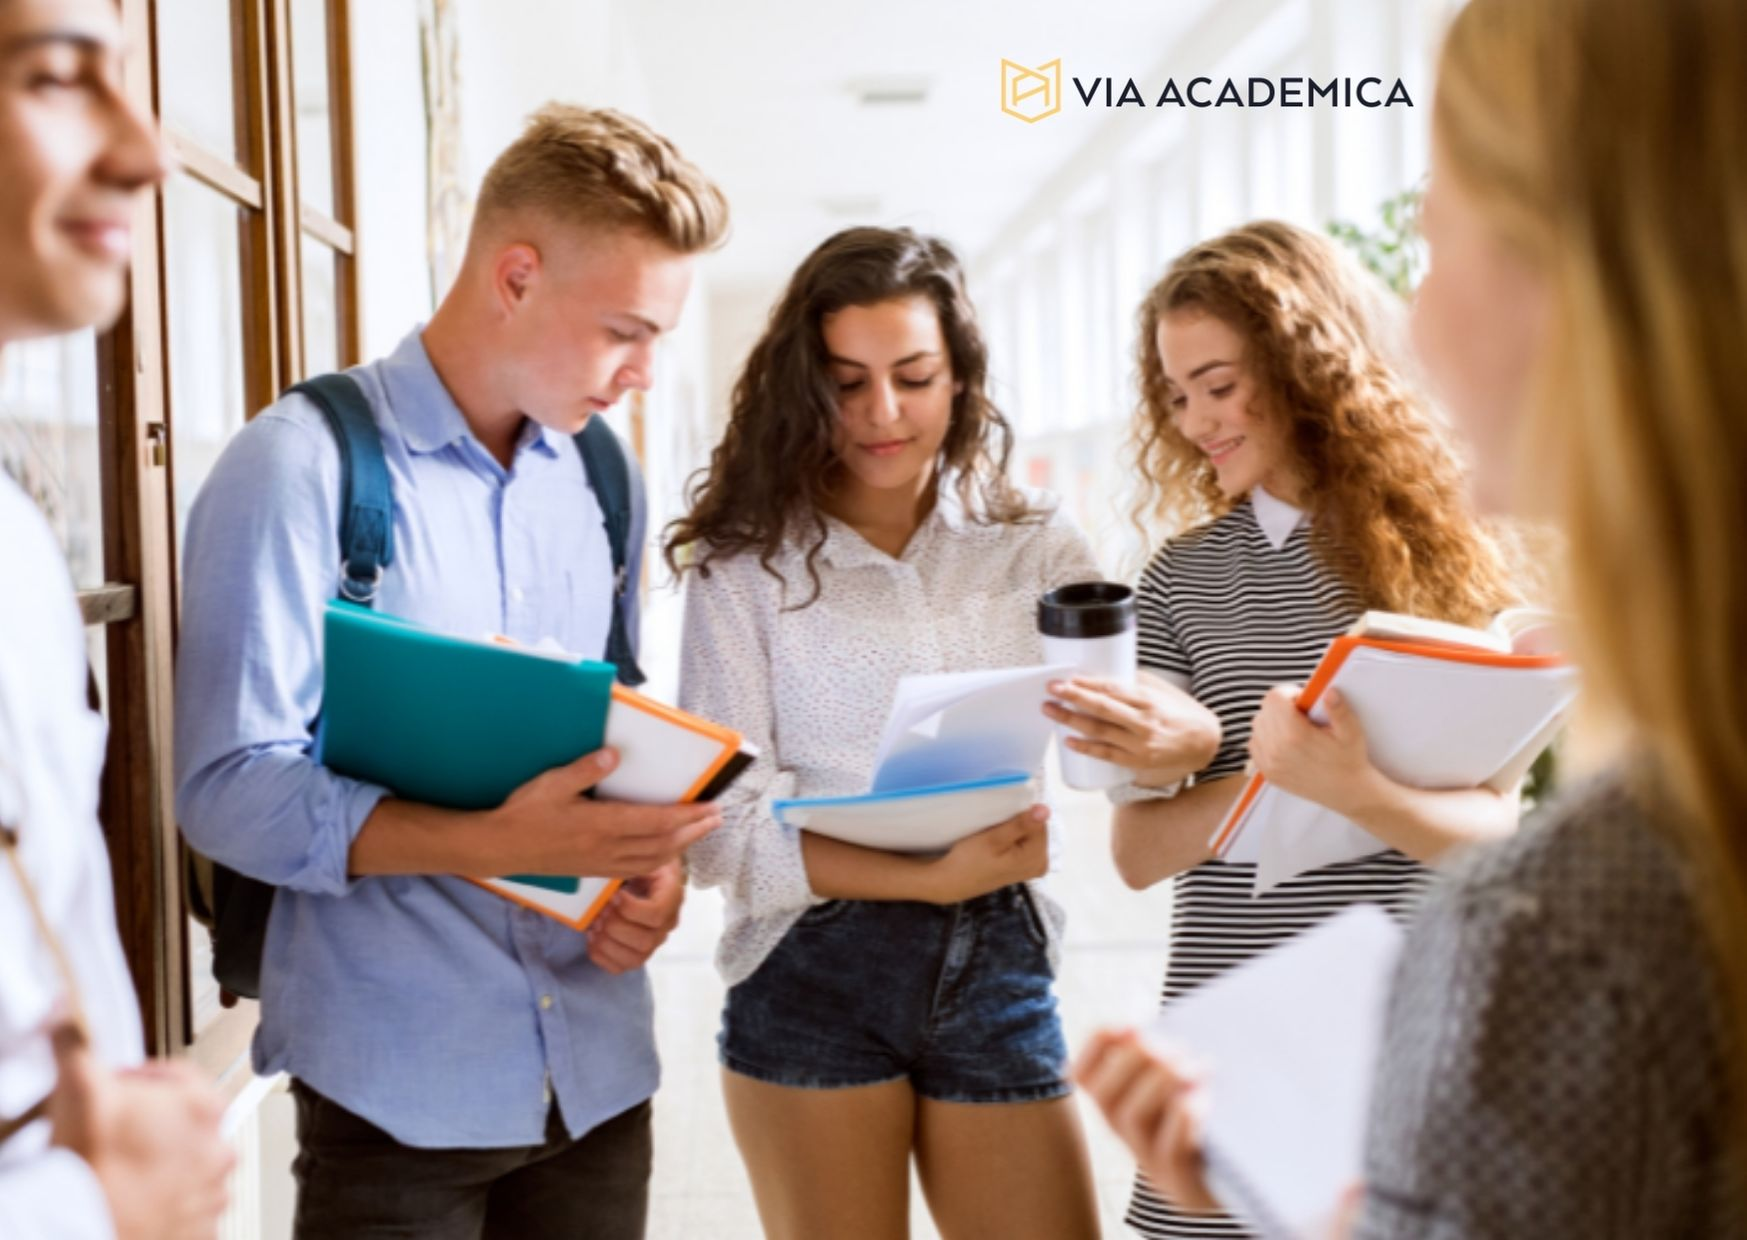 Bocconi Early Session Via Academica